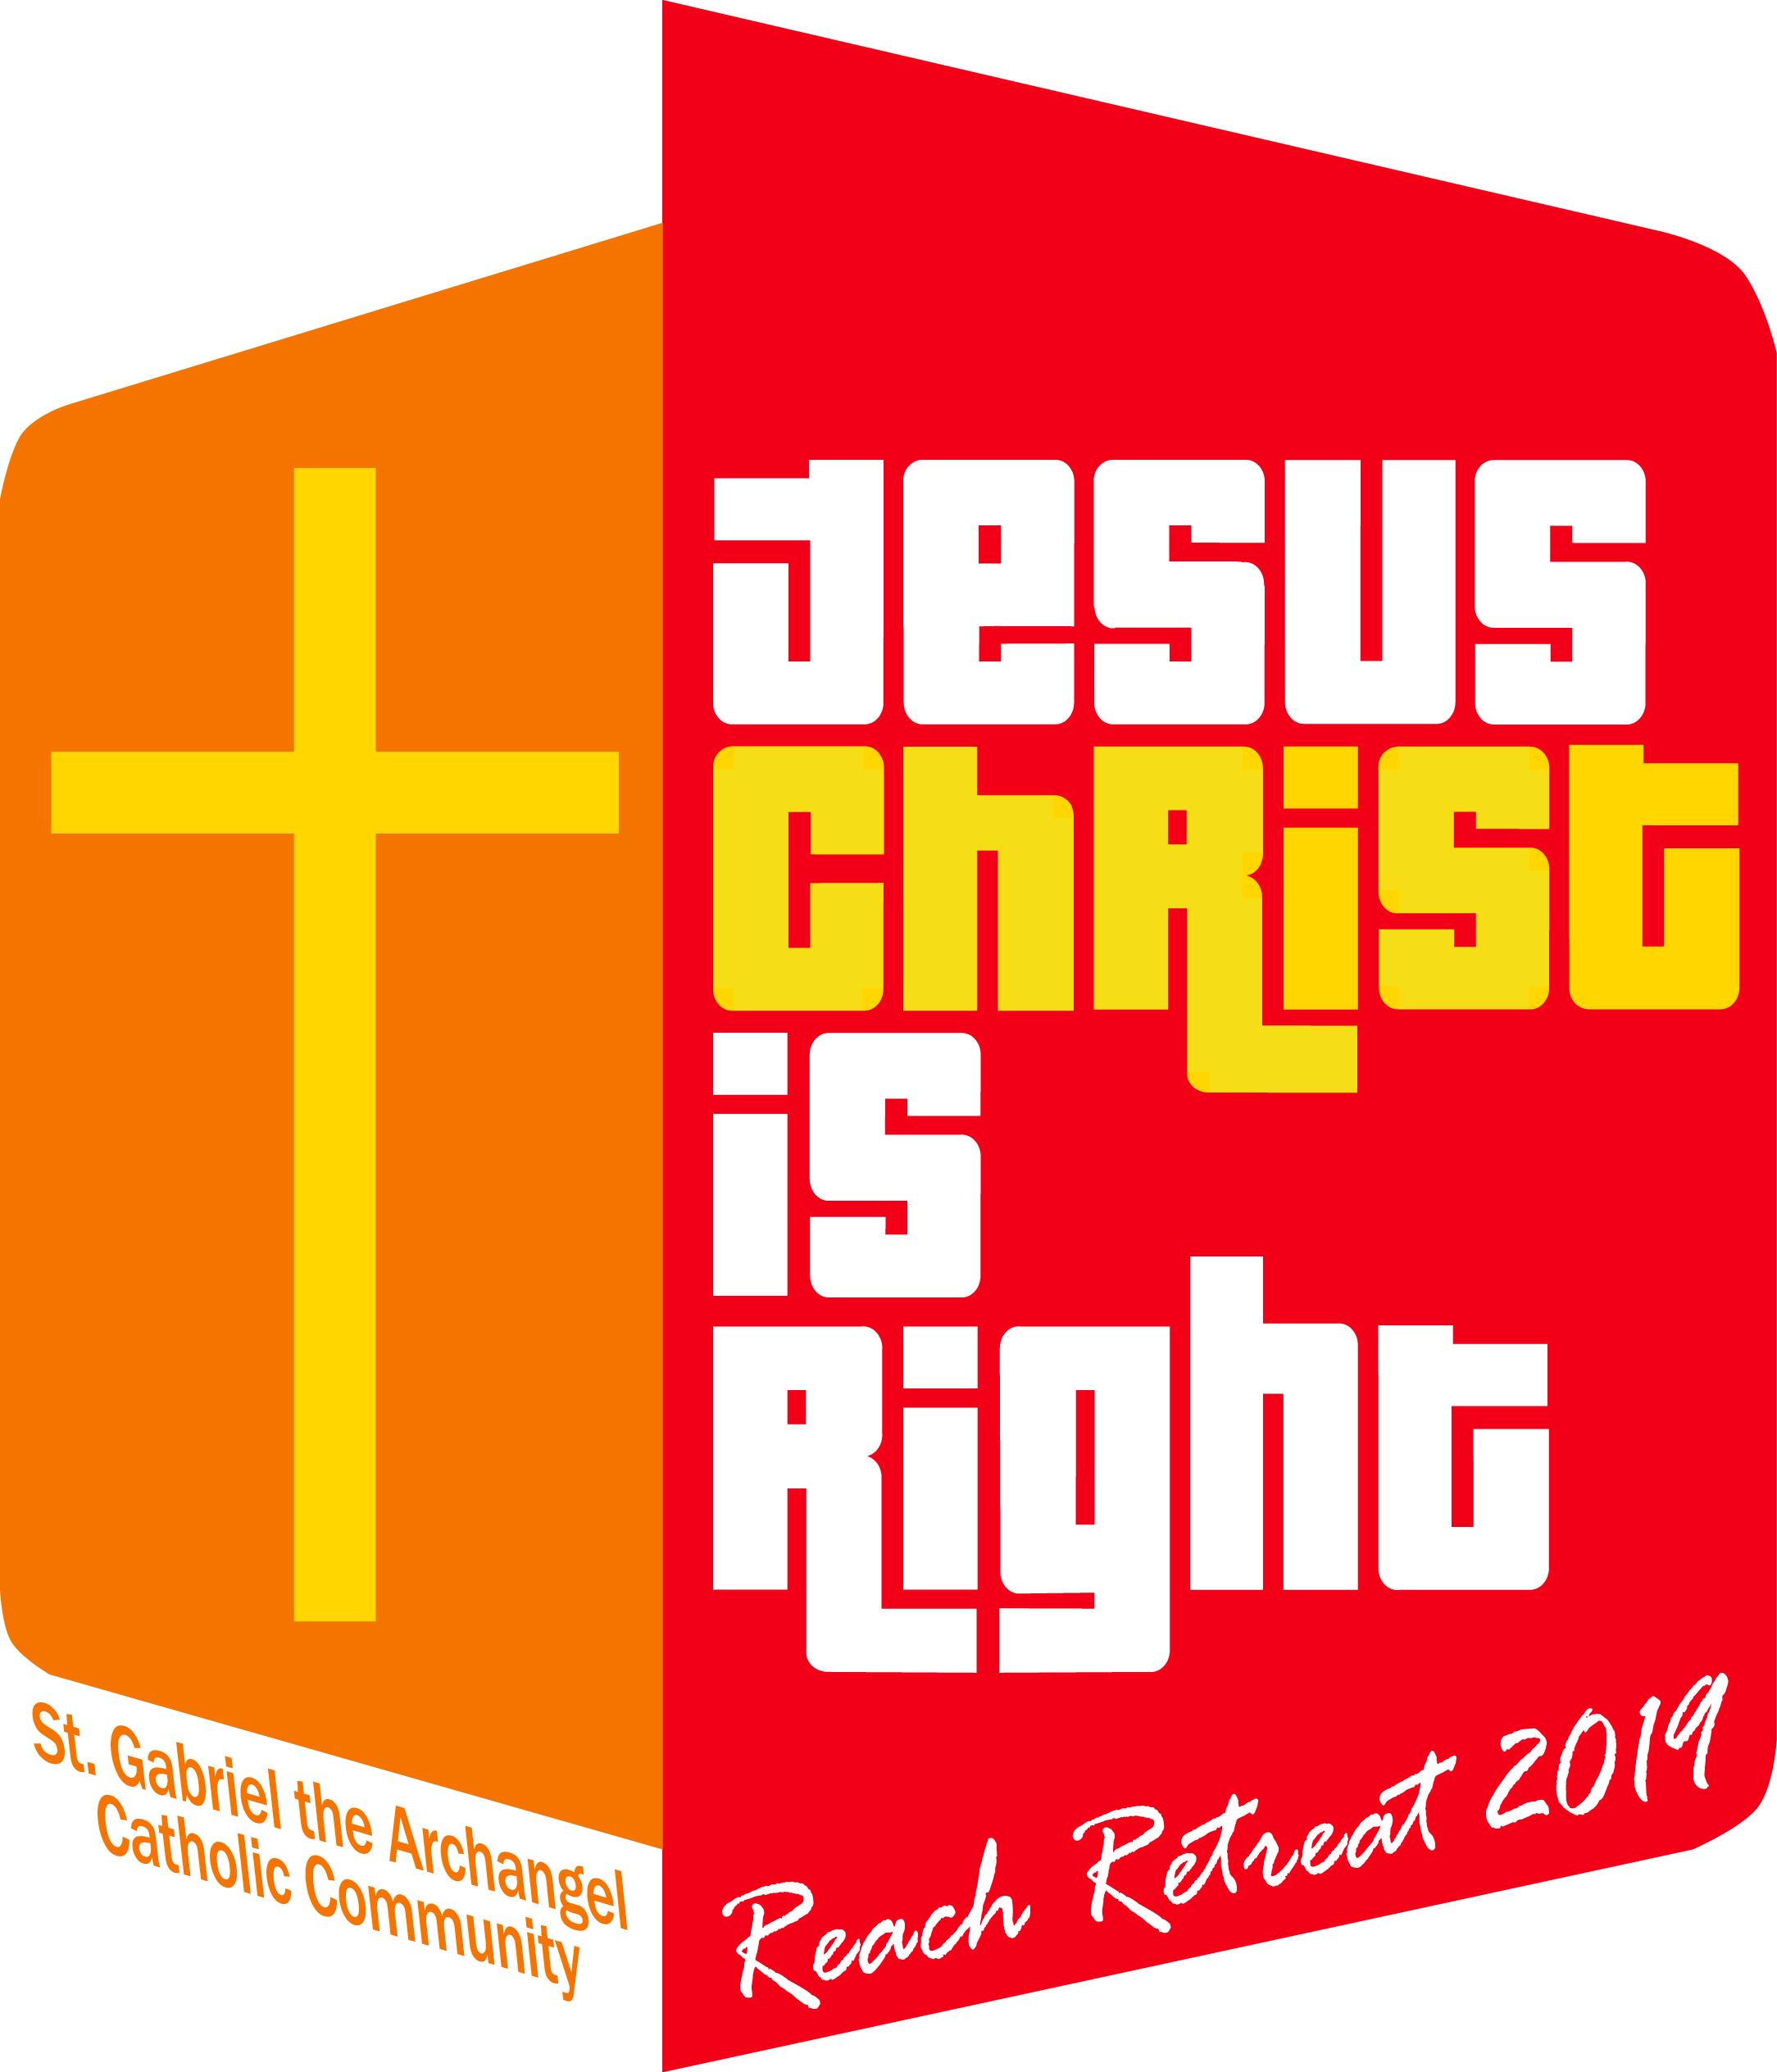 2019 REACH Retreat Logo.jpg